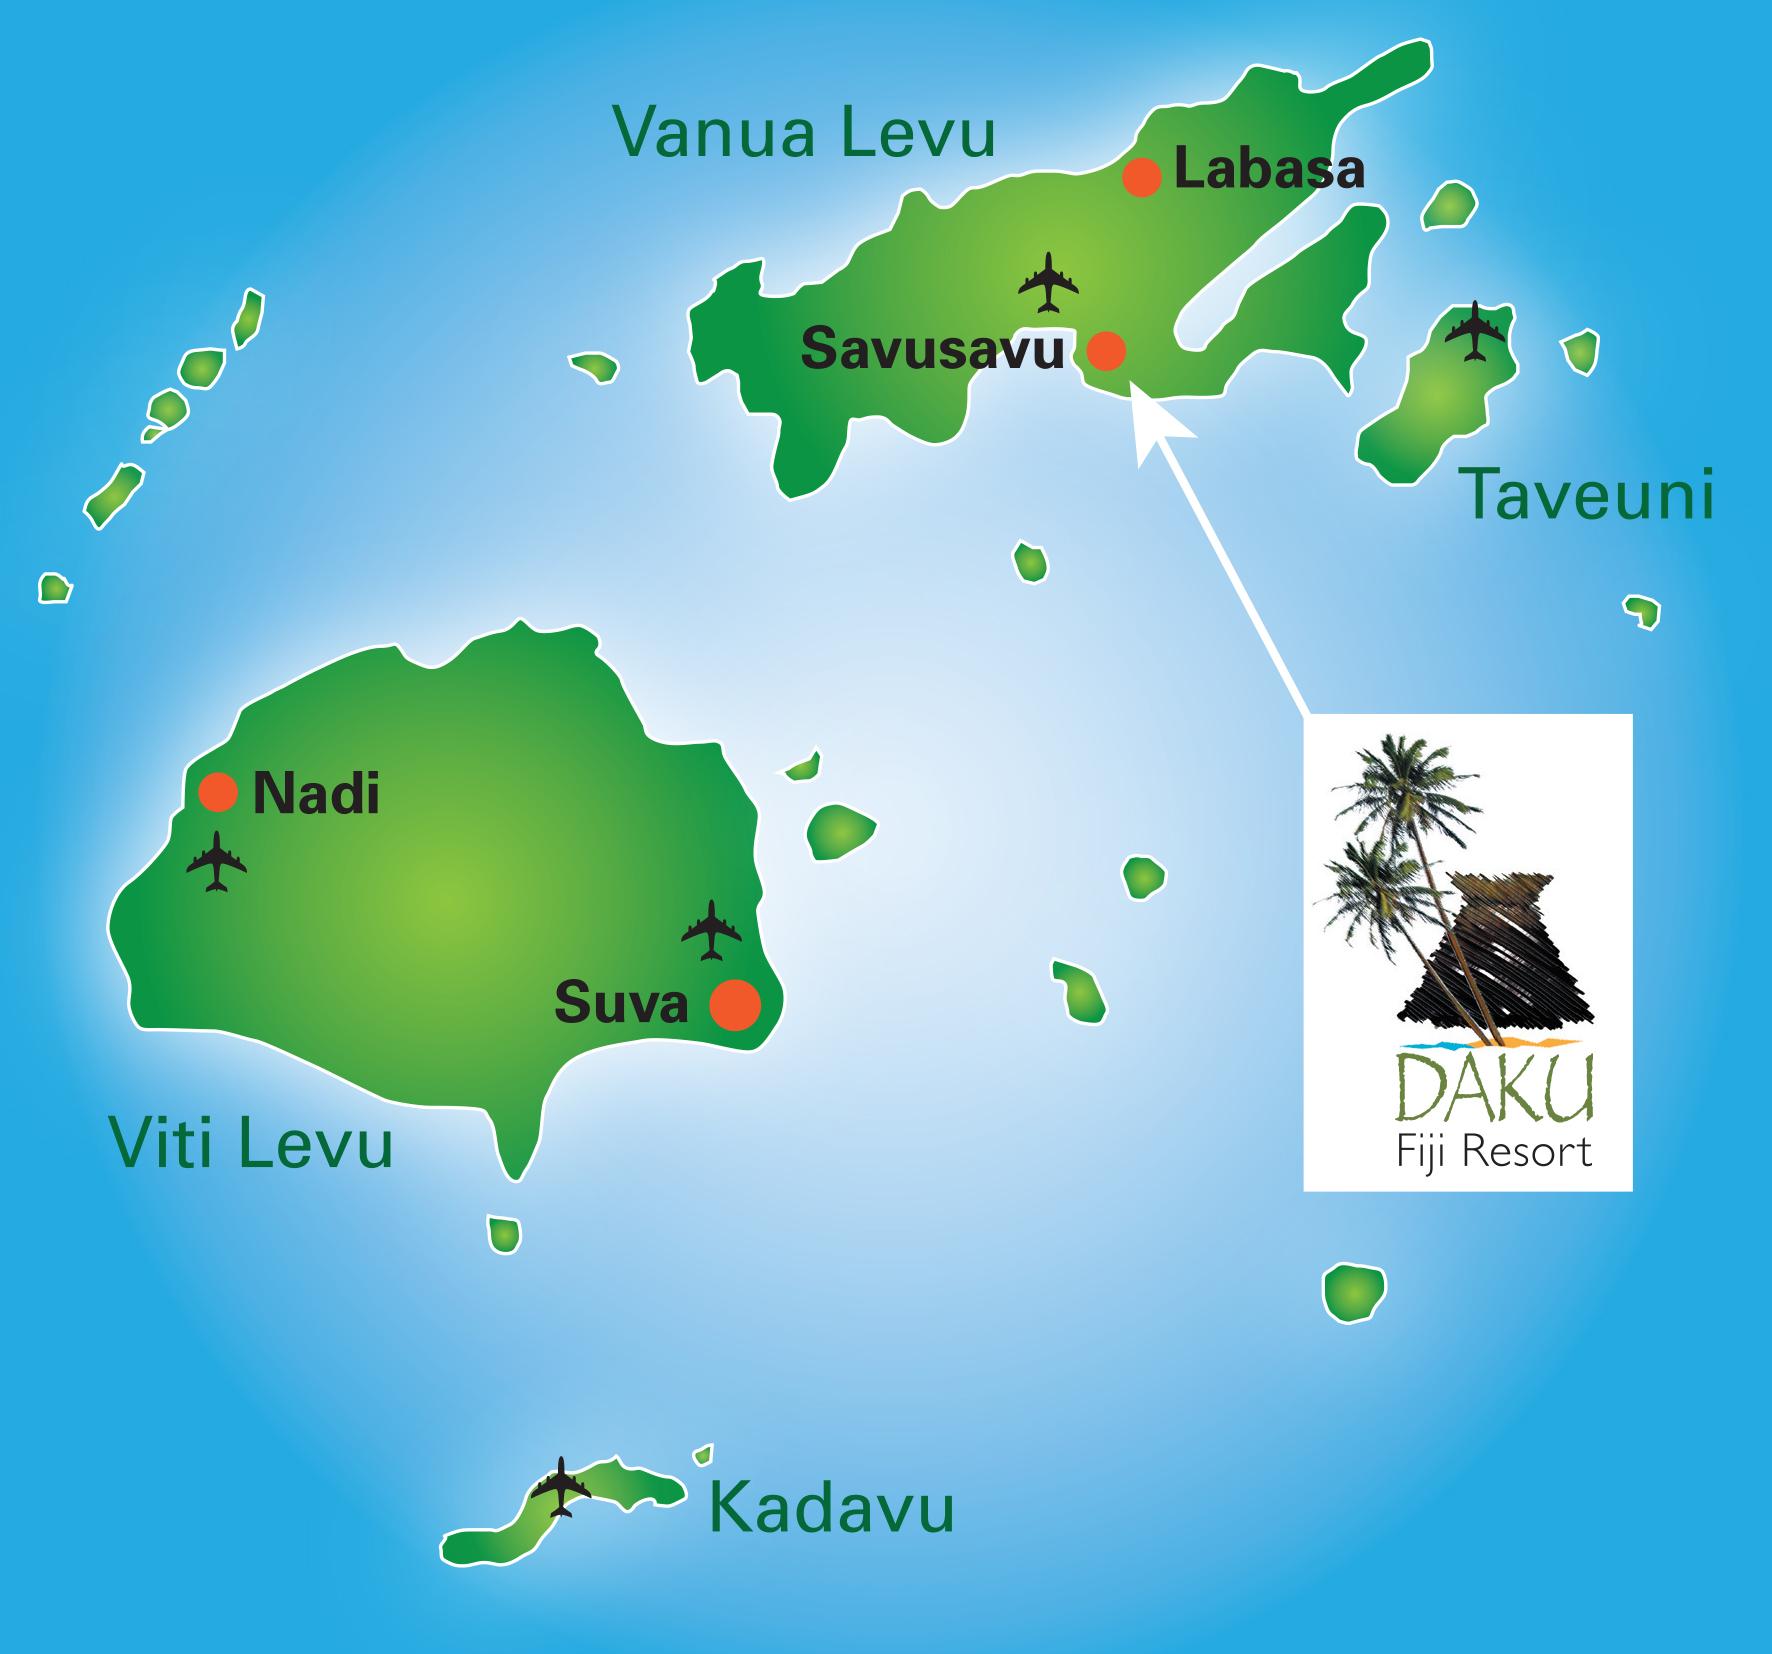 The map of the location of Daku Resort, in Savusavu Fiji.